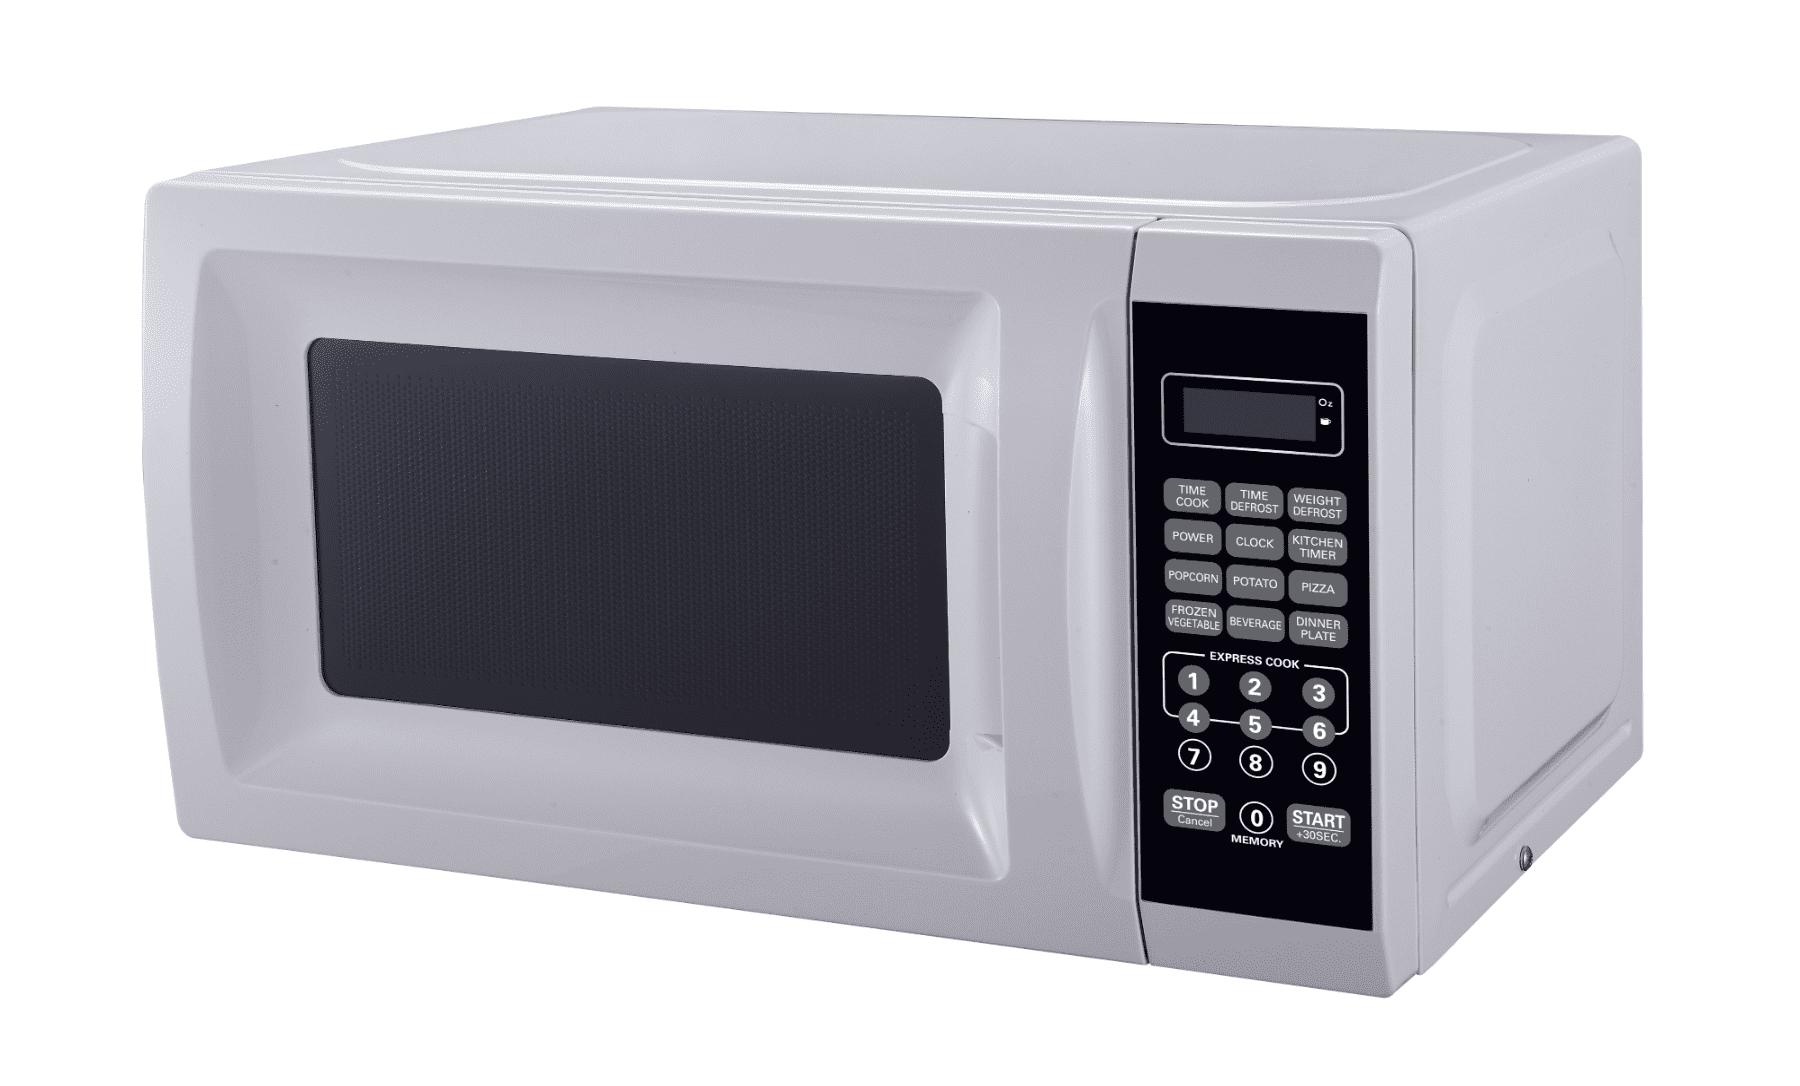 Mainstays 700W Output Microwave Oven - Walmart.com